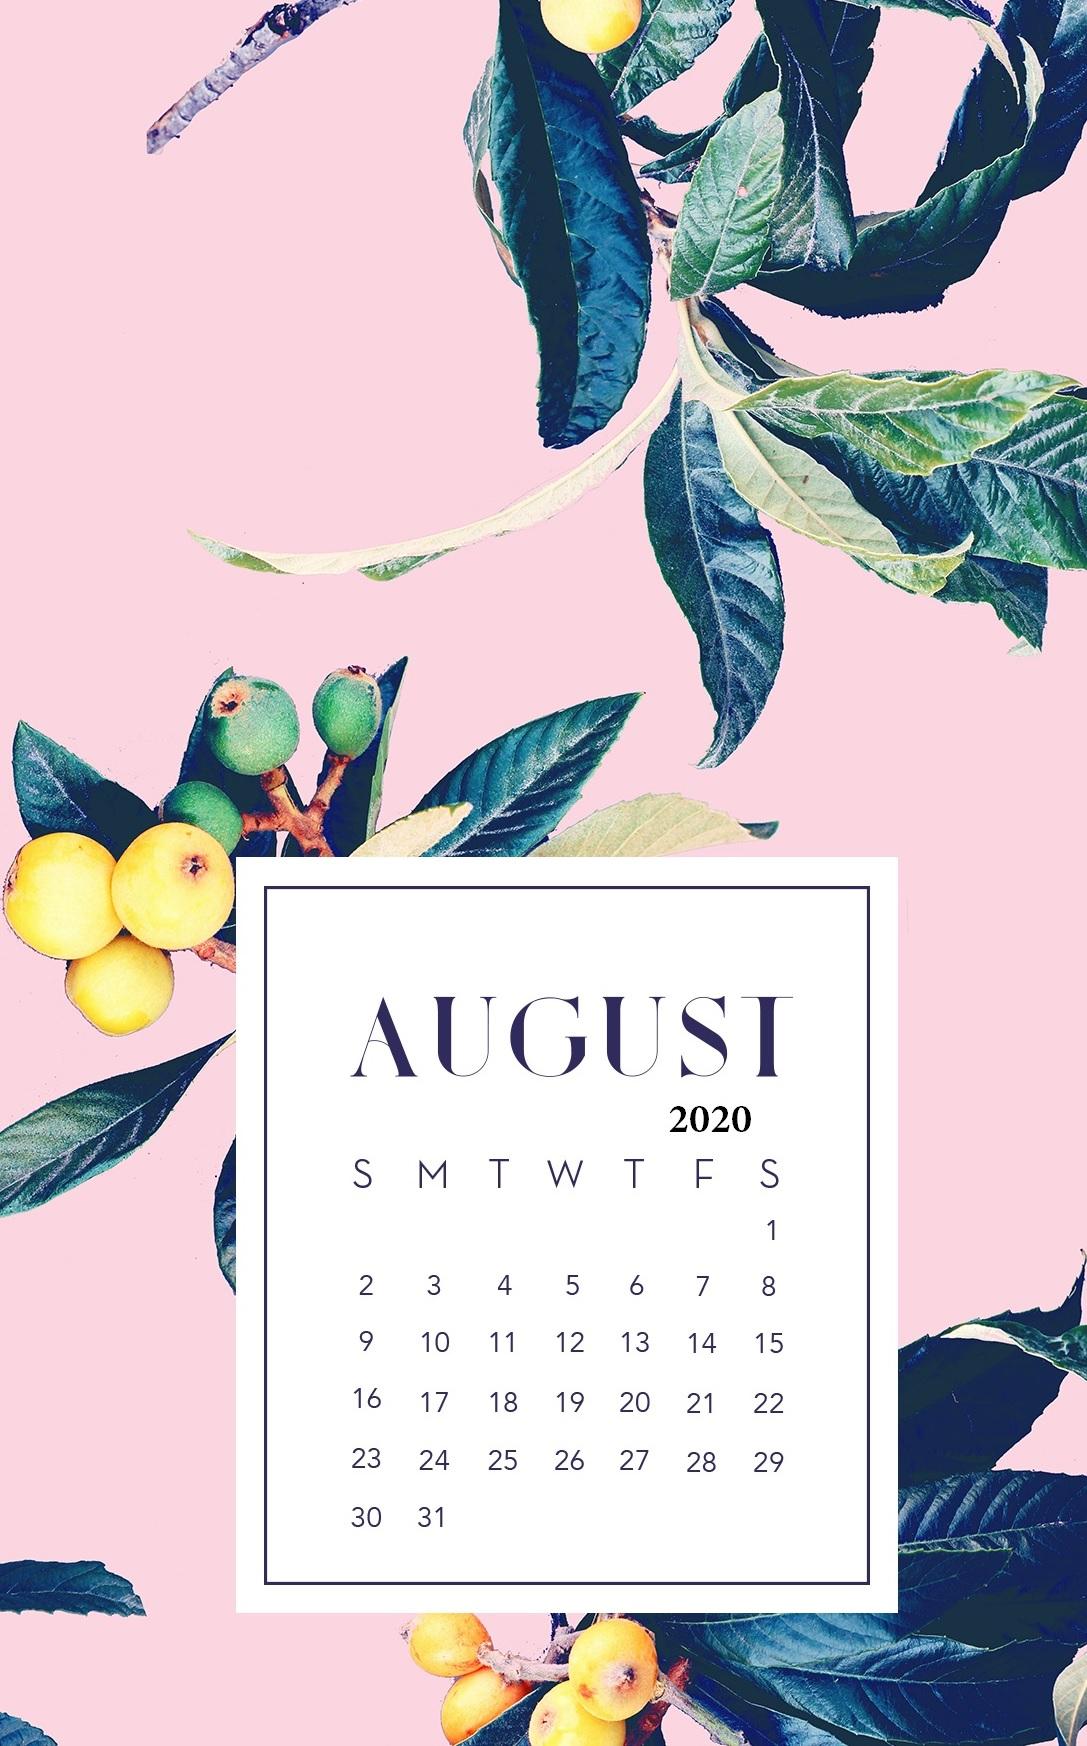 August 2020 Smartphone Wallpaper